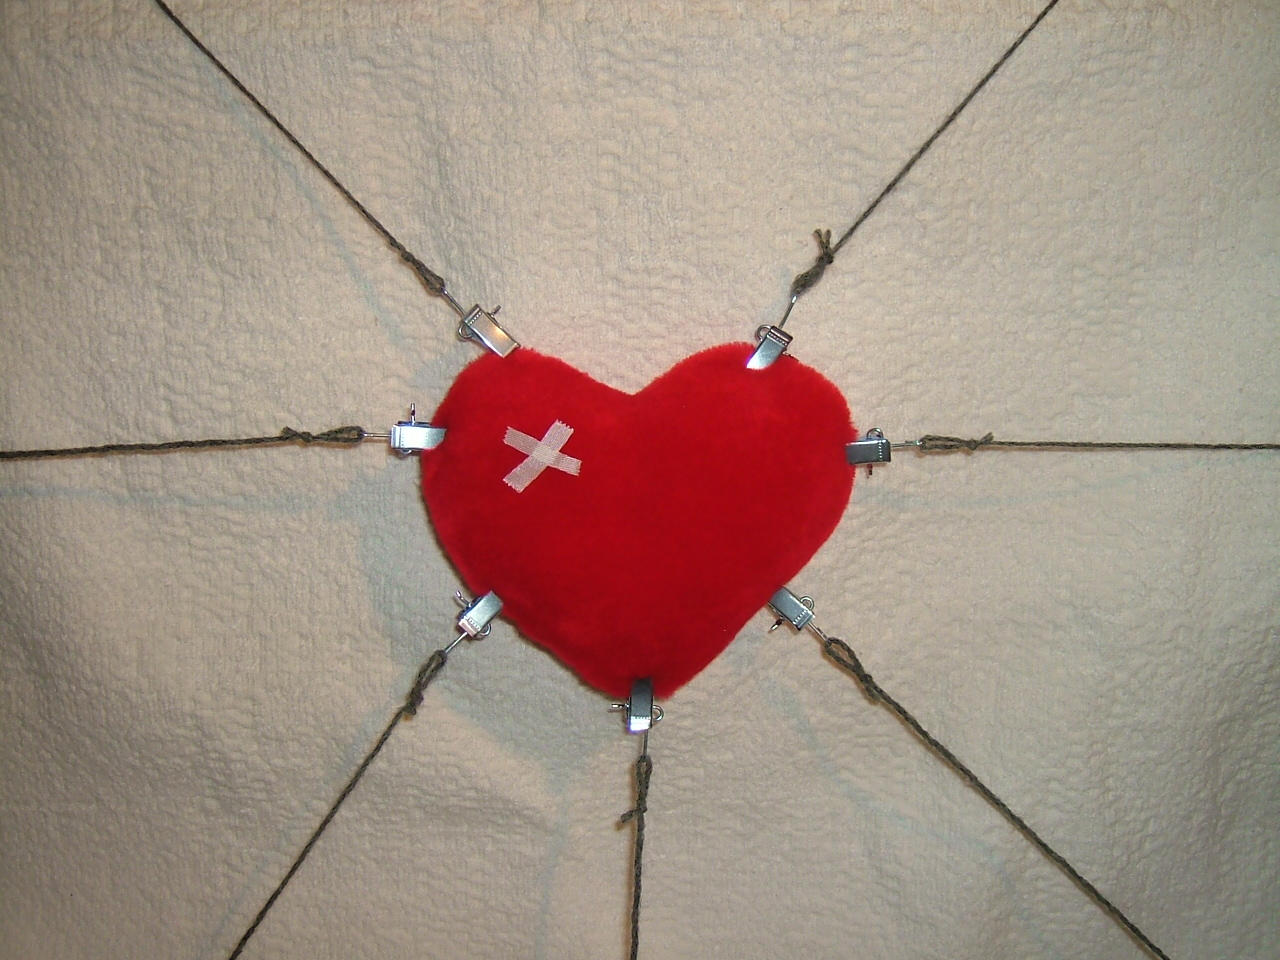 Heart - Torn apart by Futchi